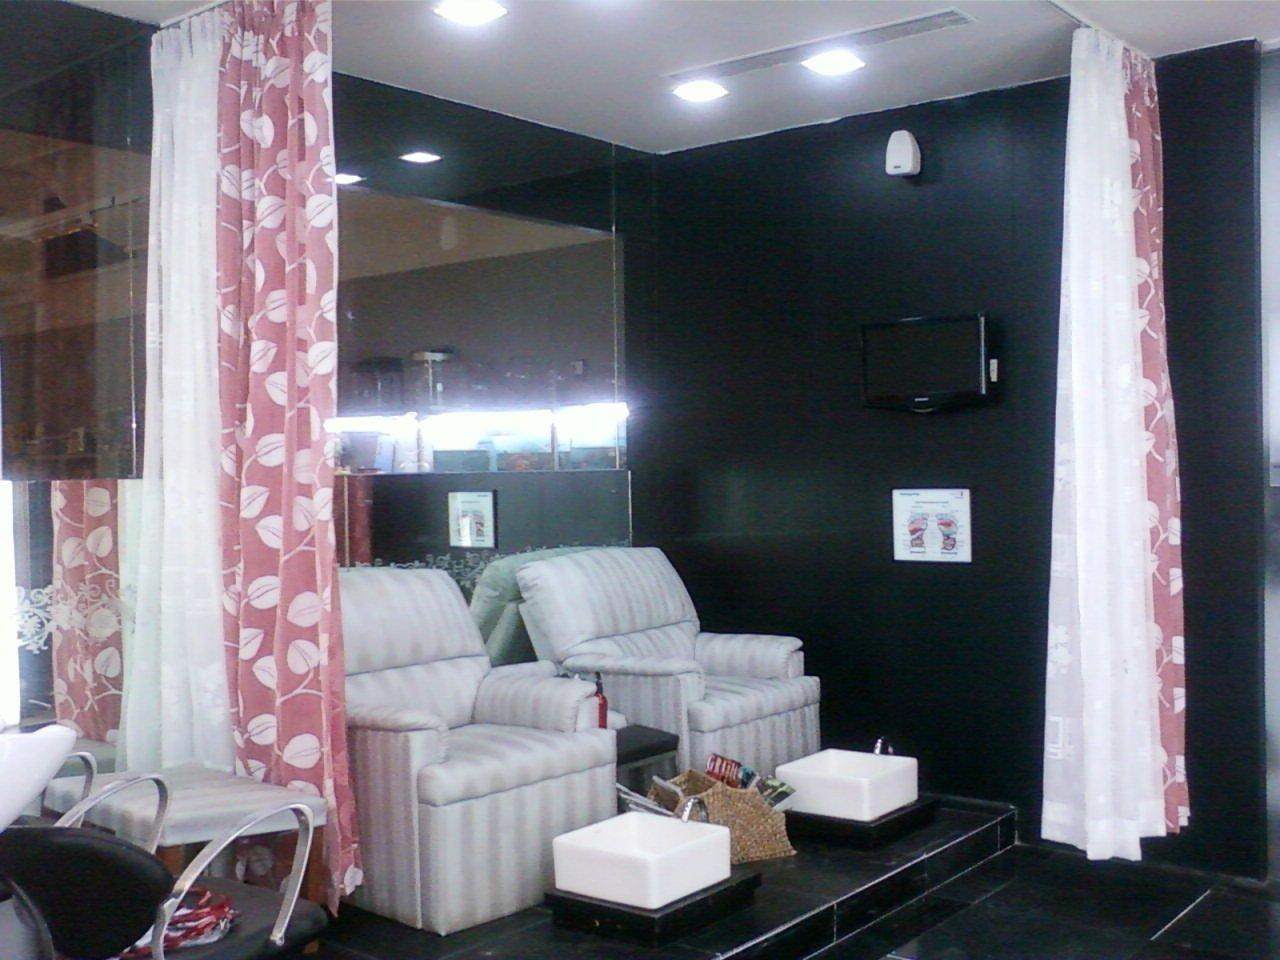 Salon Footspa Stations Buy Salon Design Product on Alibabacom